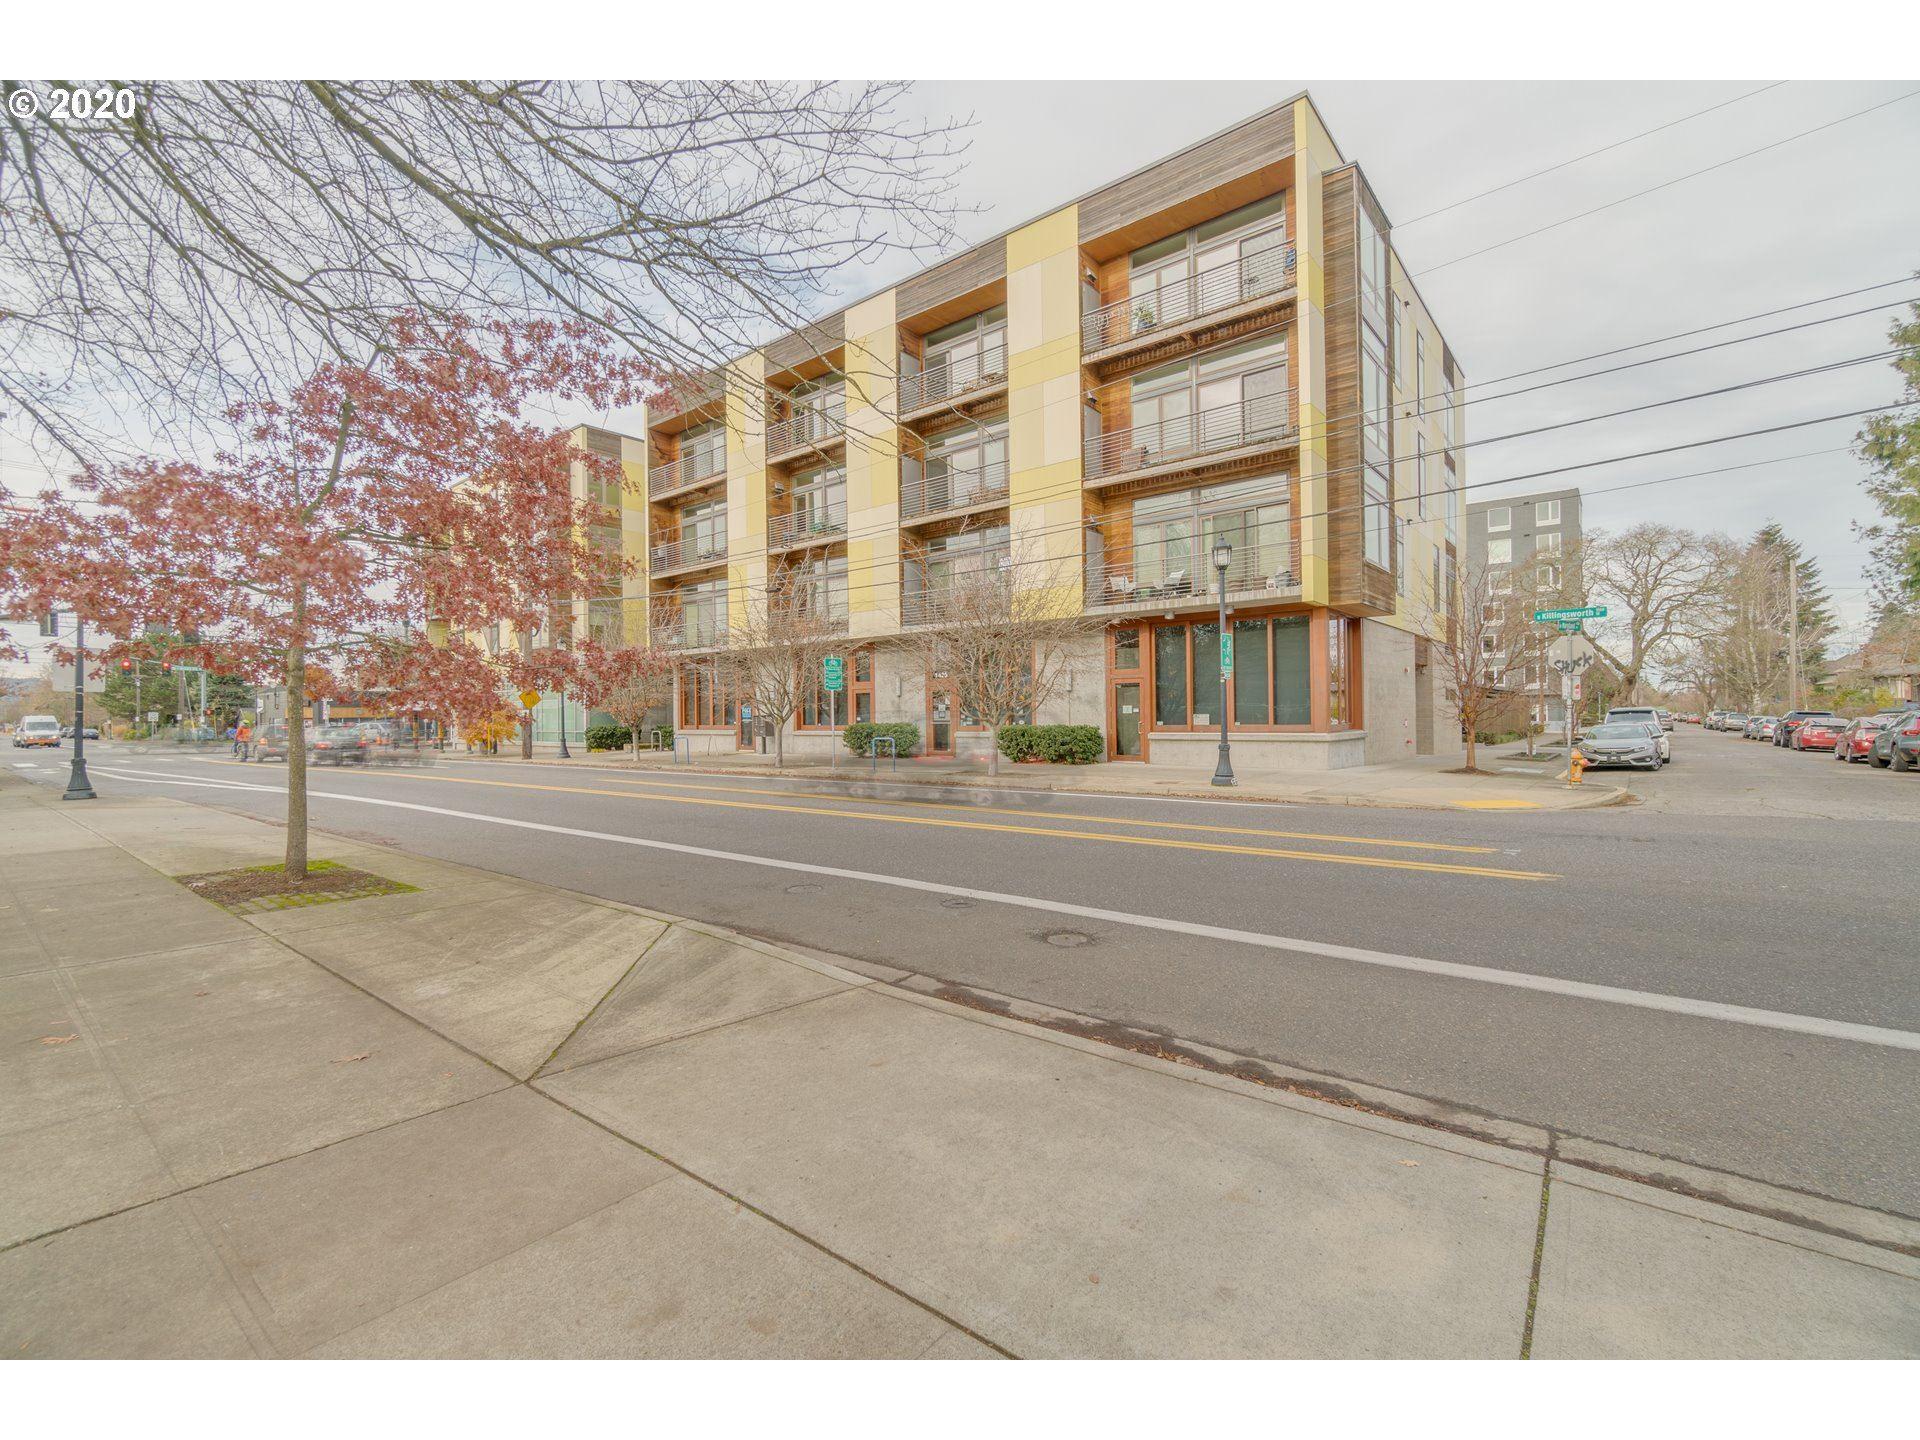 1455 N KILLINGSWORTH ST #211, Portland, OR 97217 - MLS#: 20692279